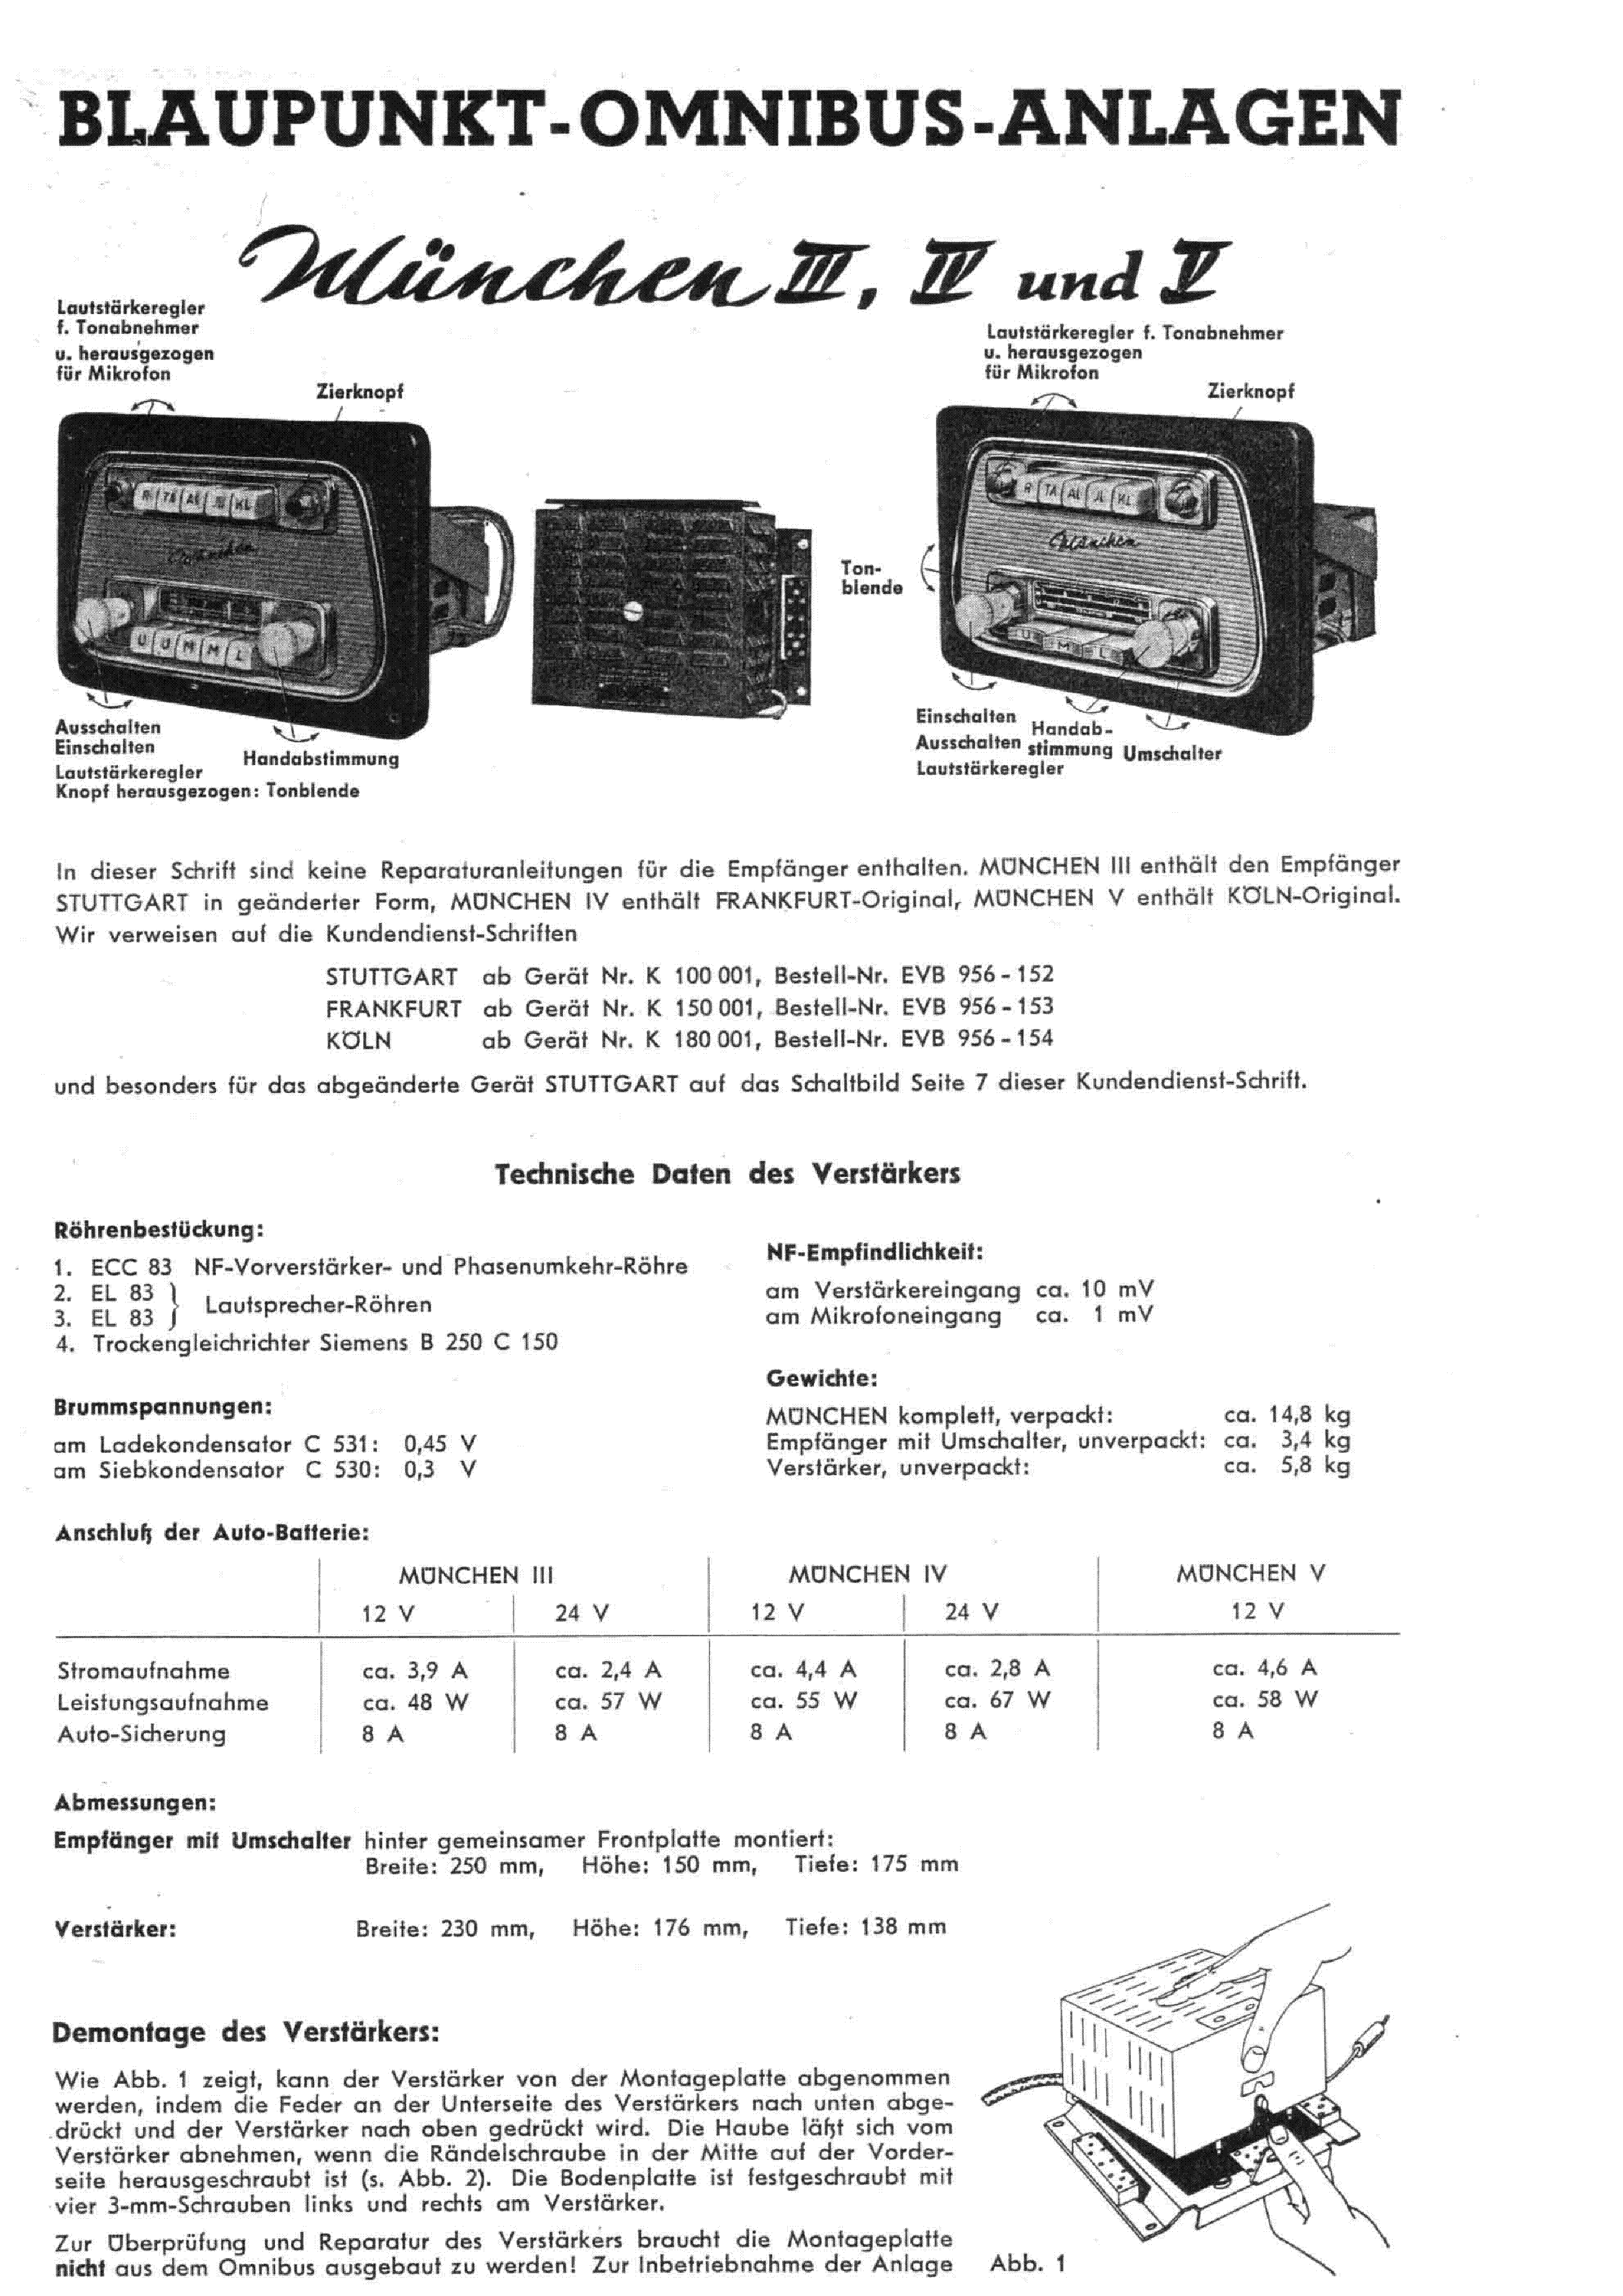 blaupunkt_munchen_iii_iv_v.pdf_1 blaupunkt munchen iii iv v service manual download, schematics Basic Electrical Wiring Diagrams at gsmx.co